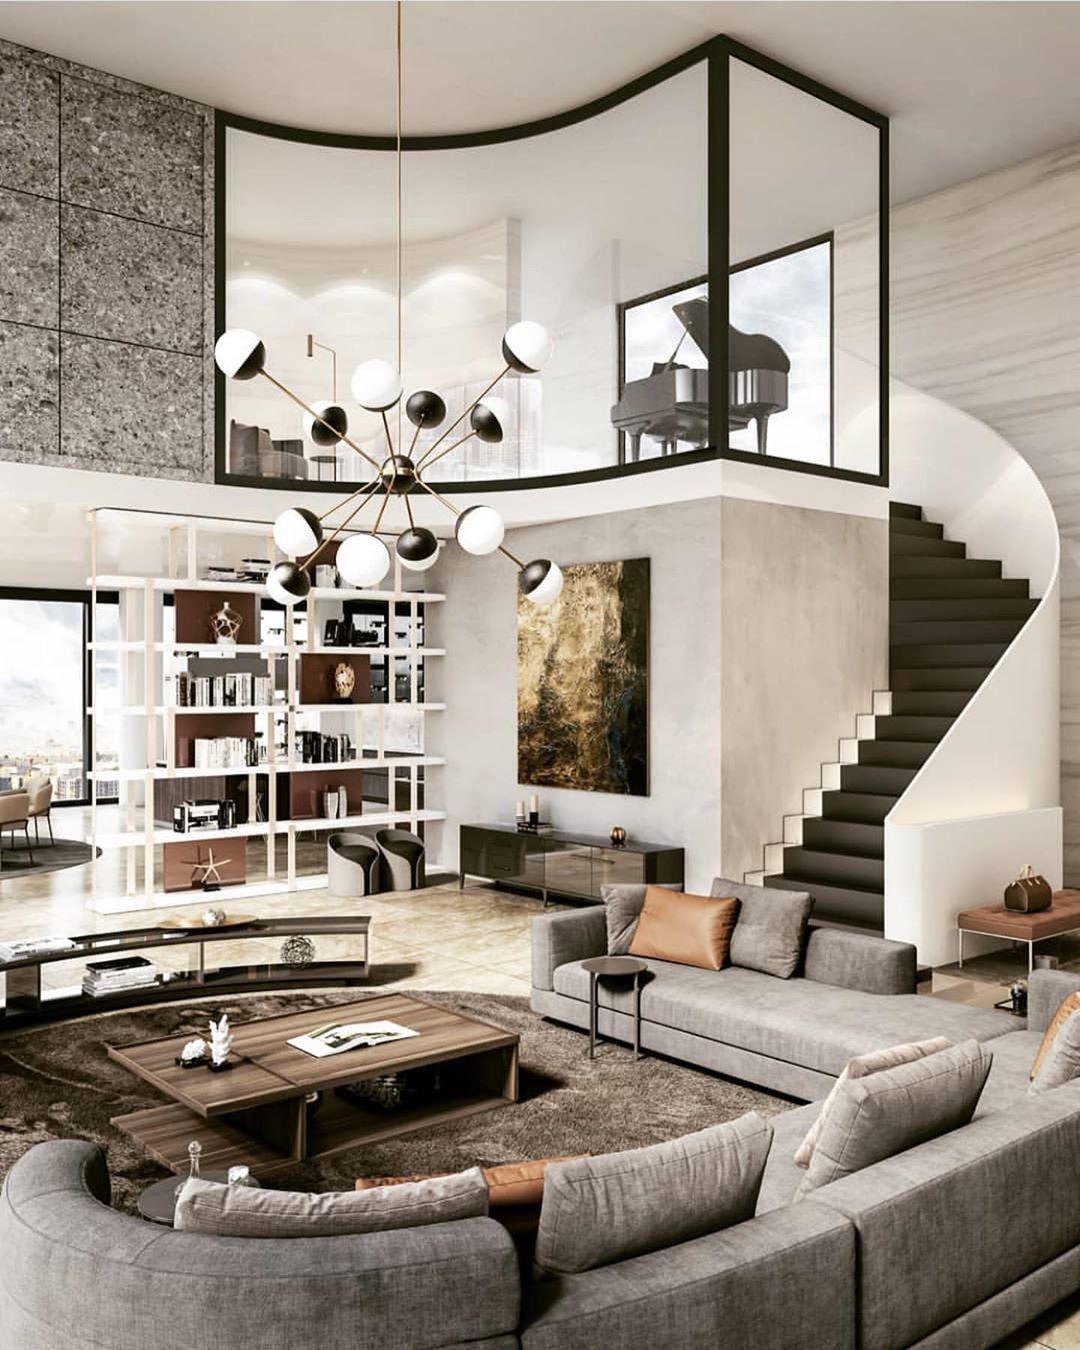 Top 10 Home Decoration Vastu Tips Best Interior Design Interior Design Software Interior Design